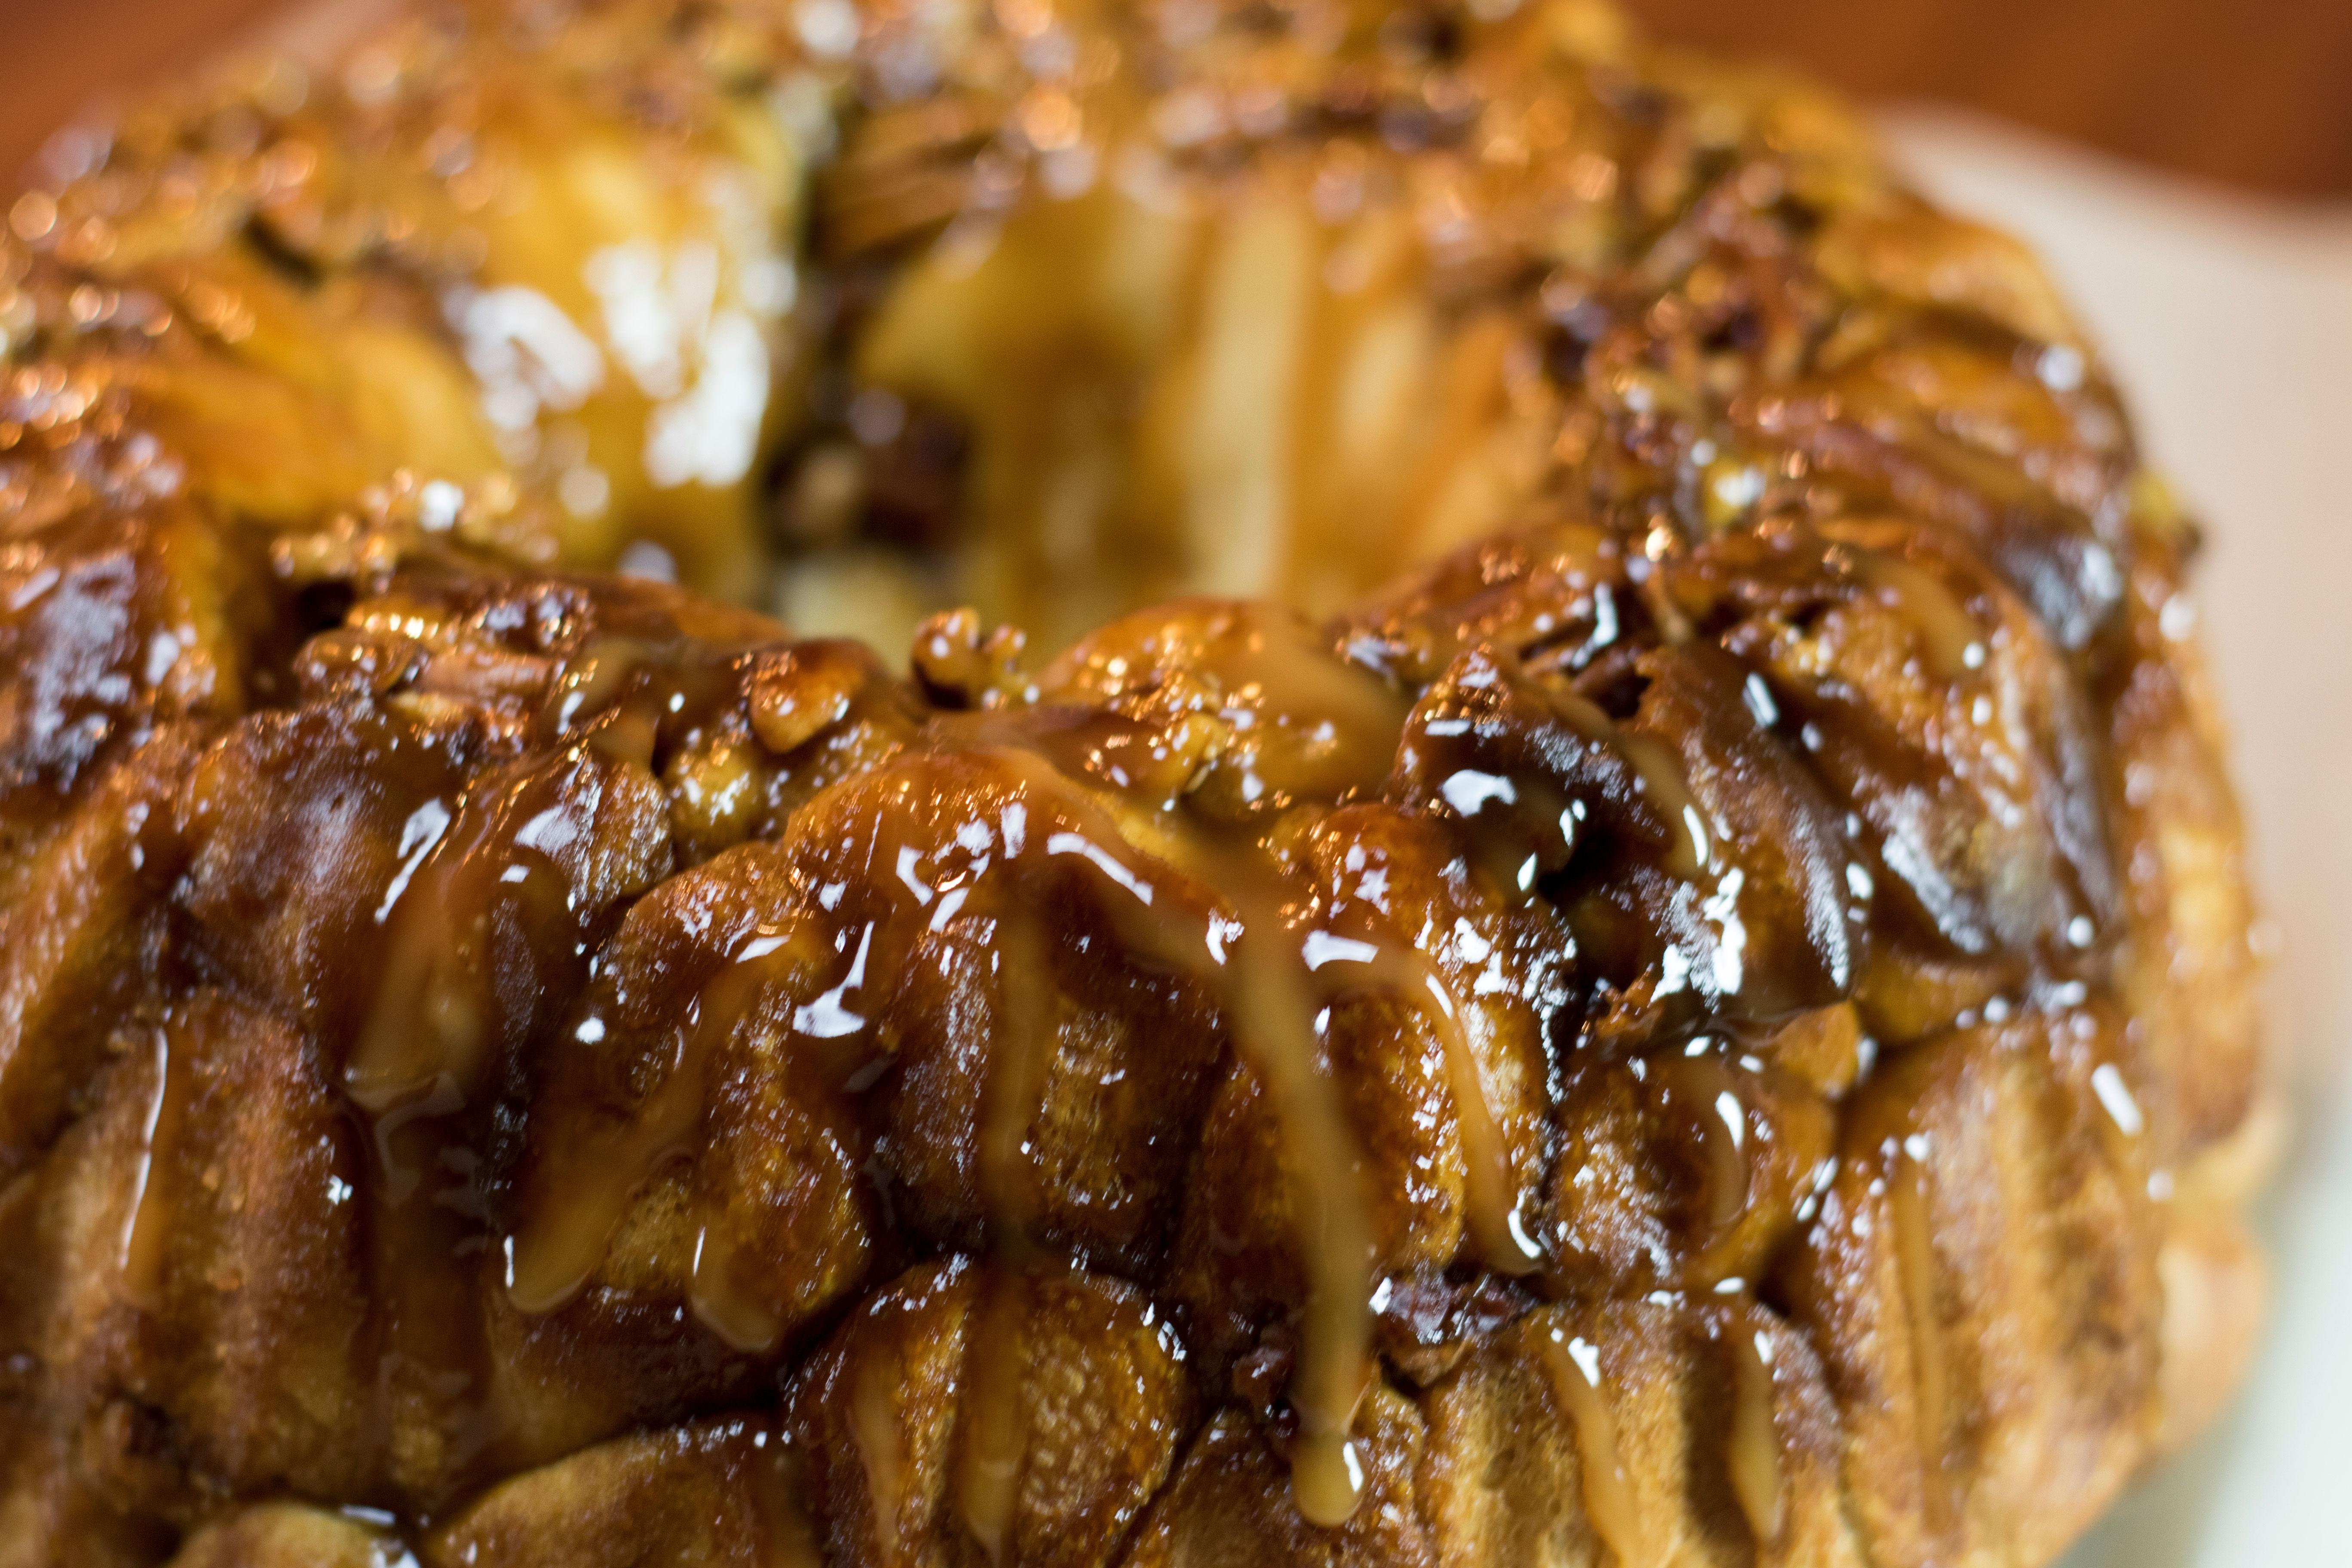 Honey Butter Carmel Pull-apart Monkey Bread Recipe